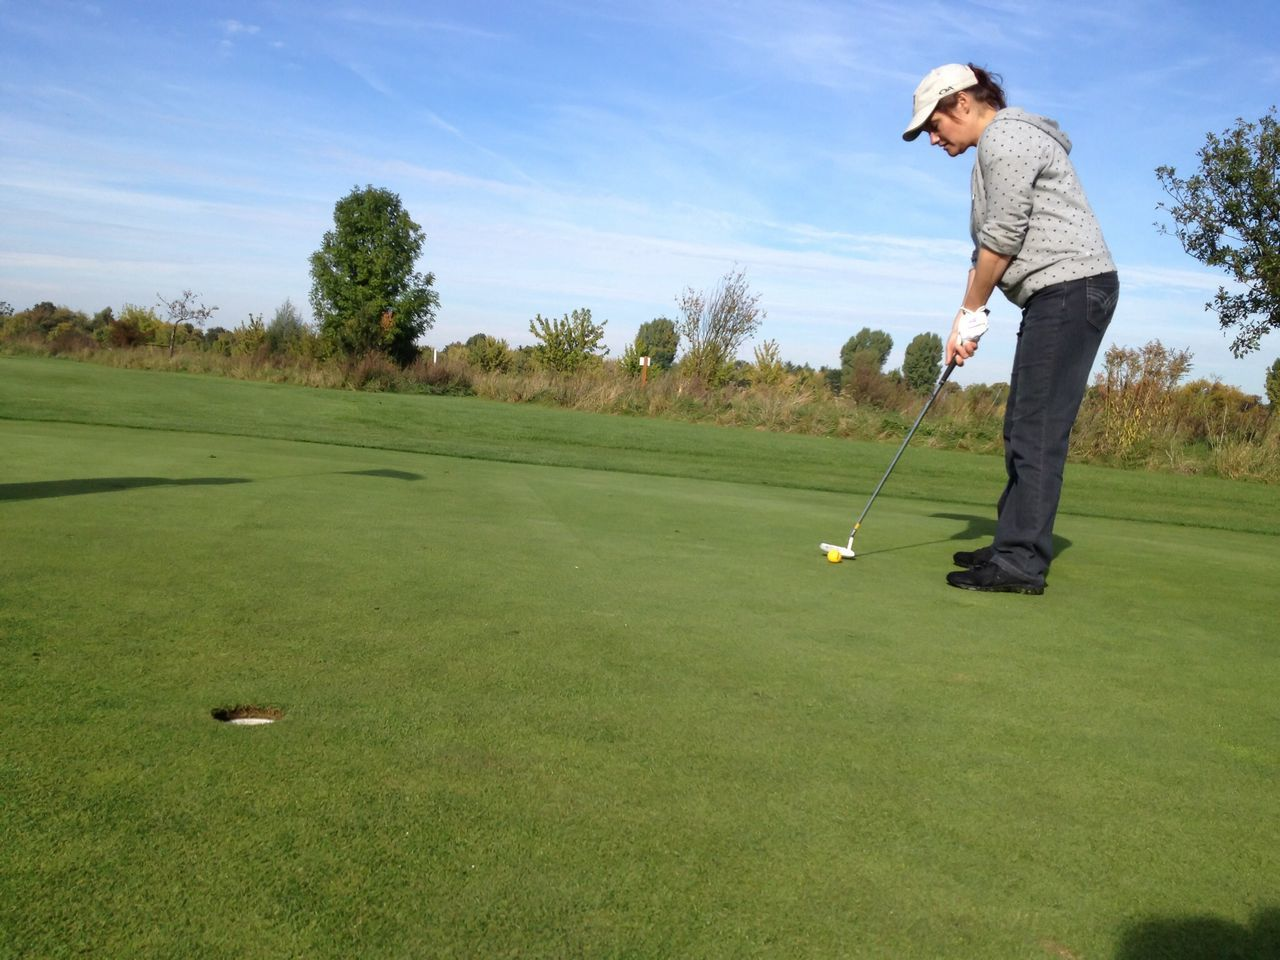 Beautiful stock photos of golf, NULL